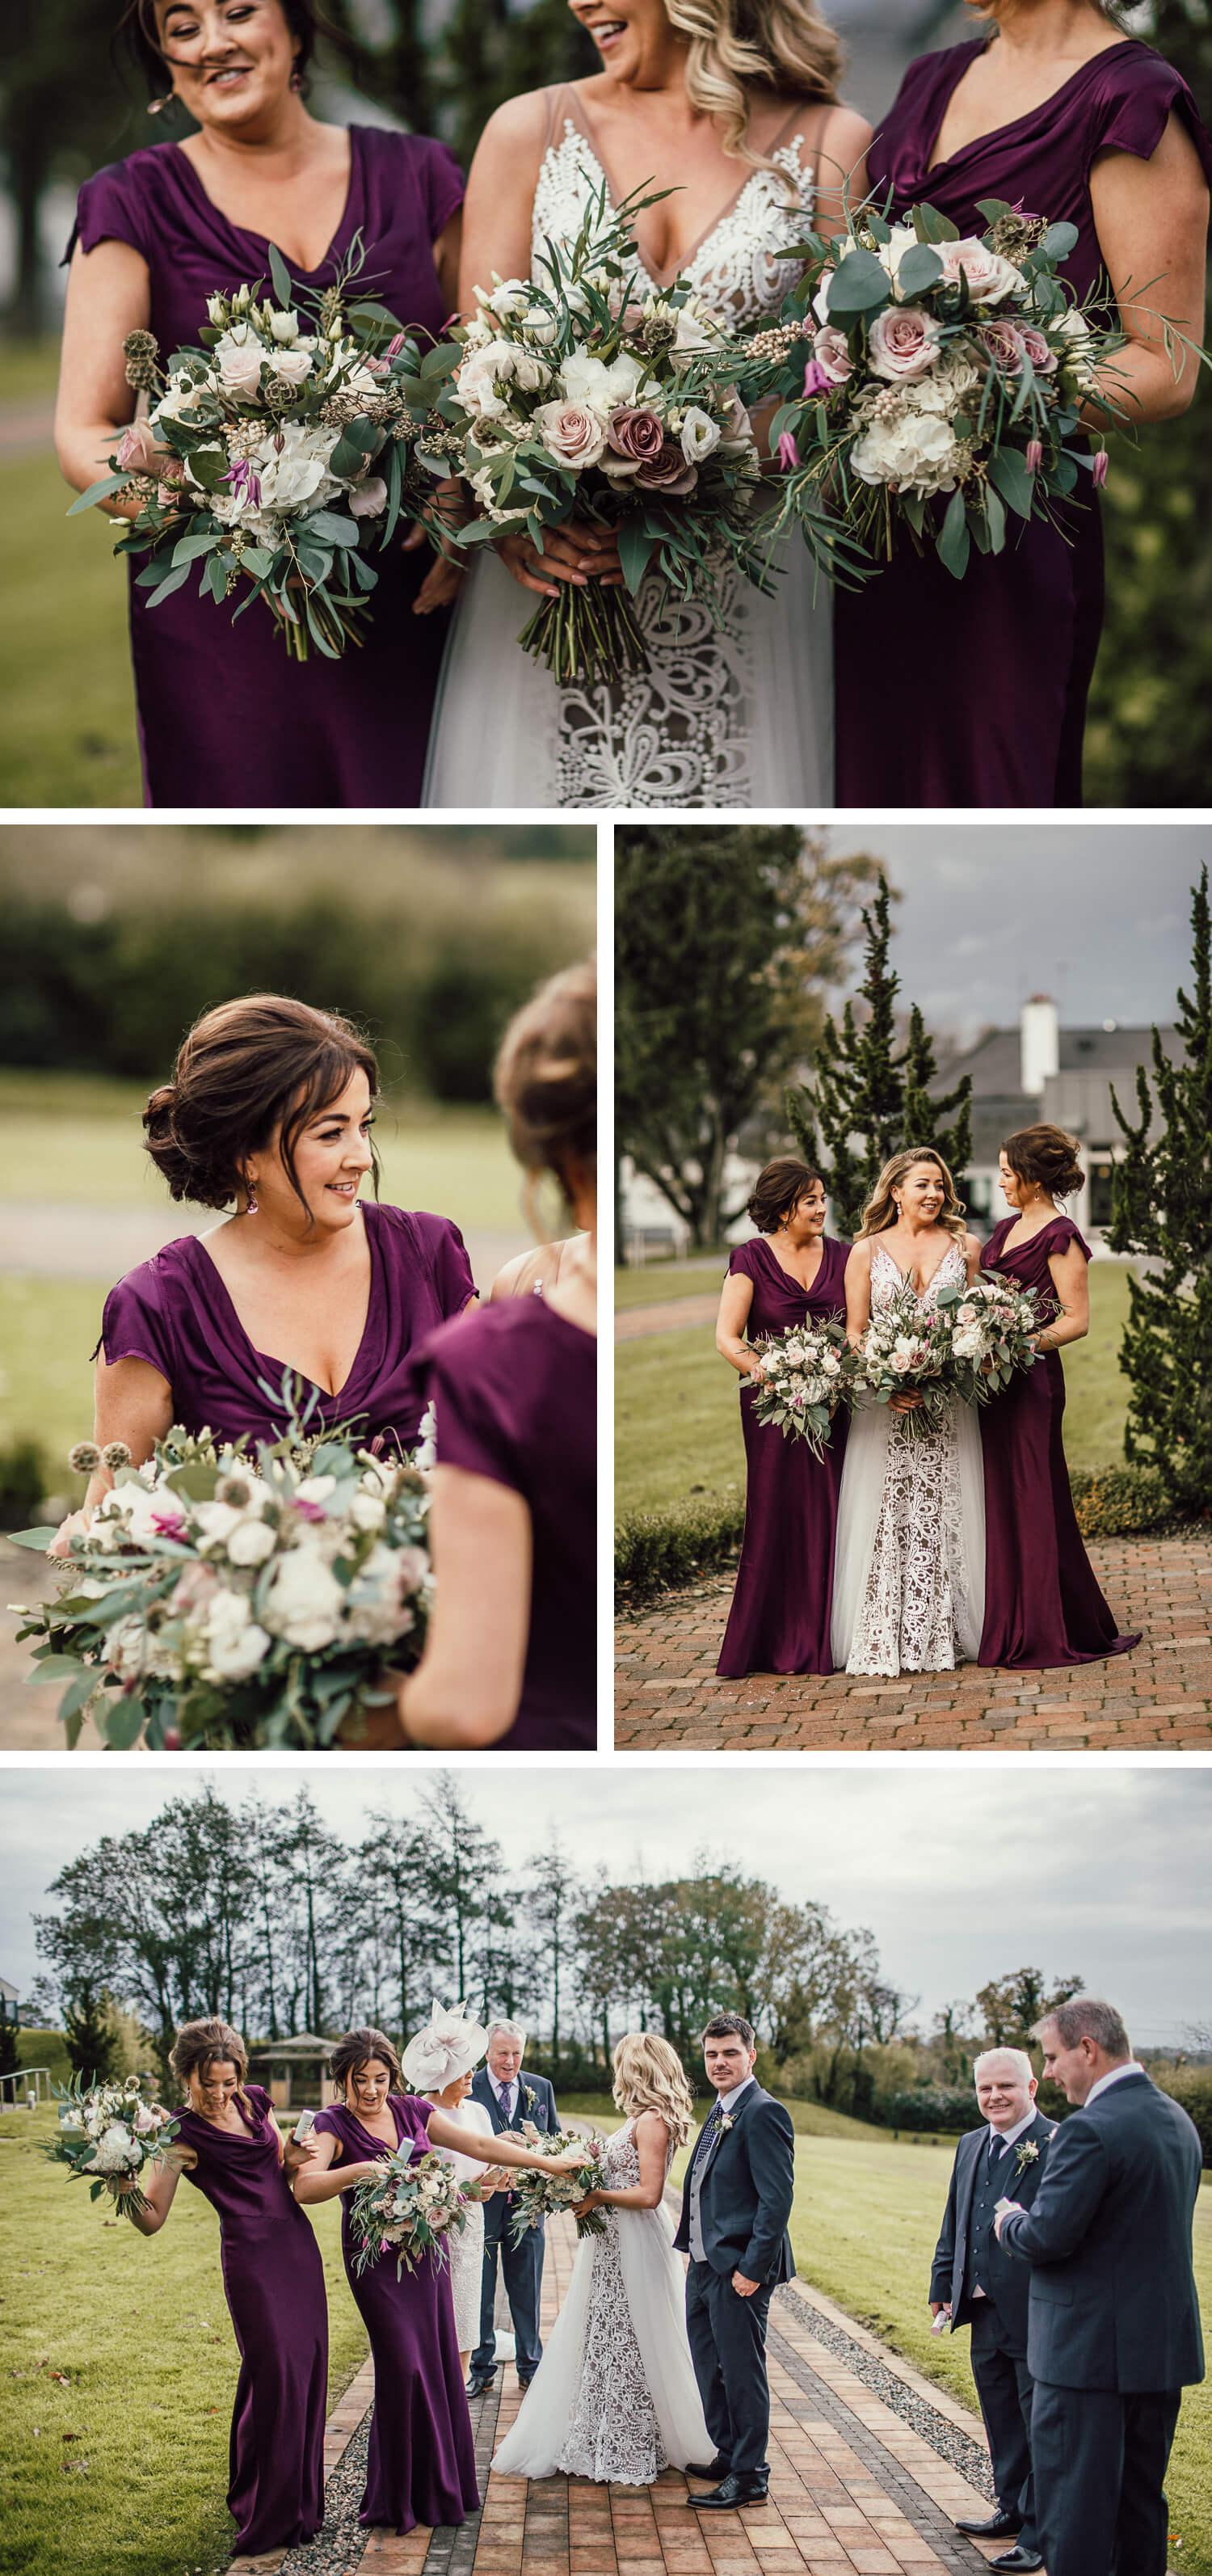 darren-fitzpatrick-photography- killyhevlin-wedding 20